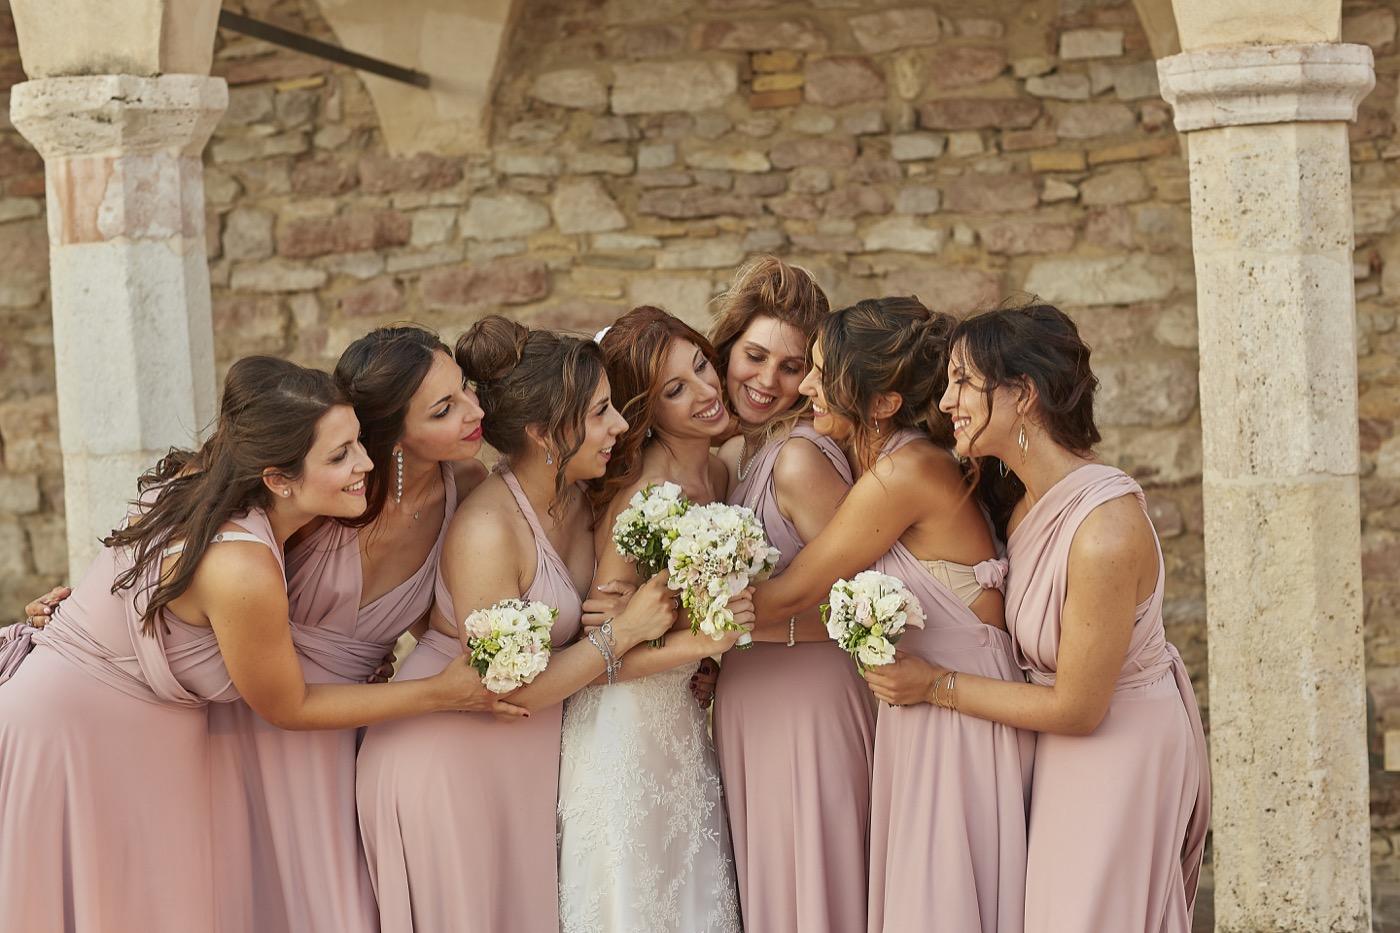 Claudio-Coppola-wedding-photographer-abbazia-7-frati-piegaro-81